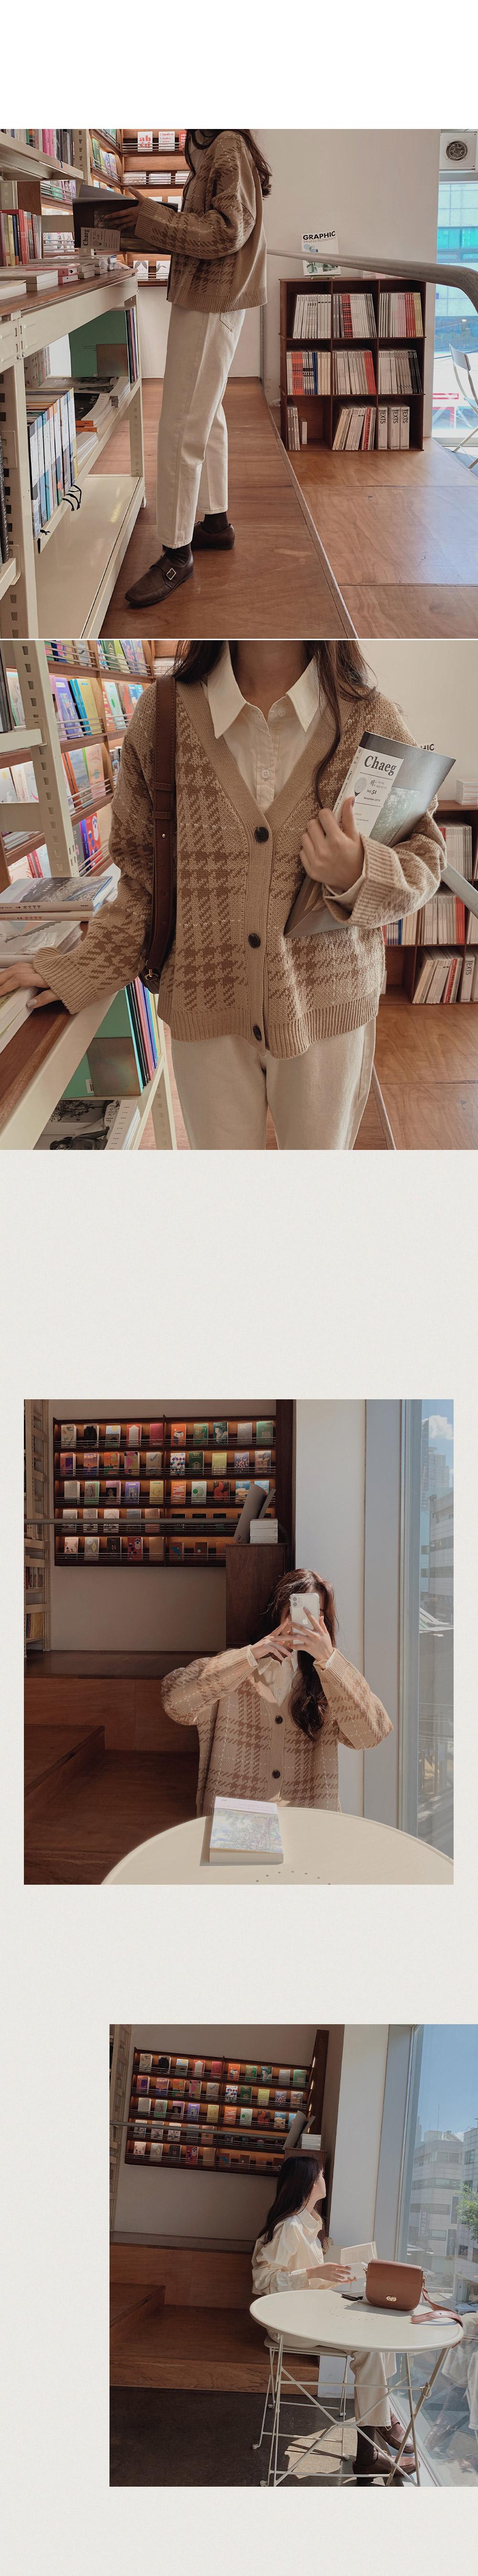 Hound check knit cardigan